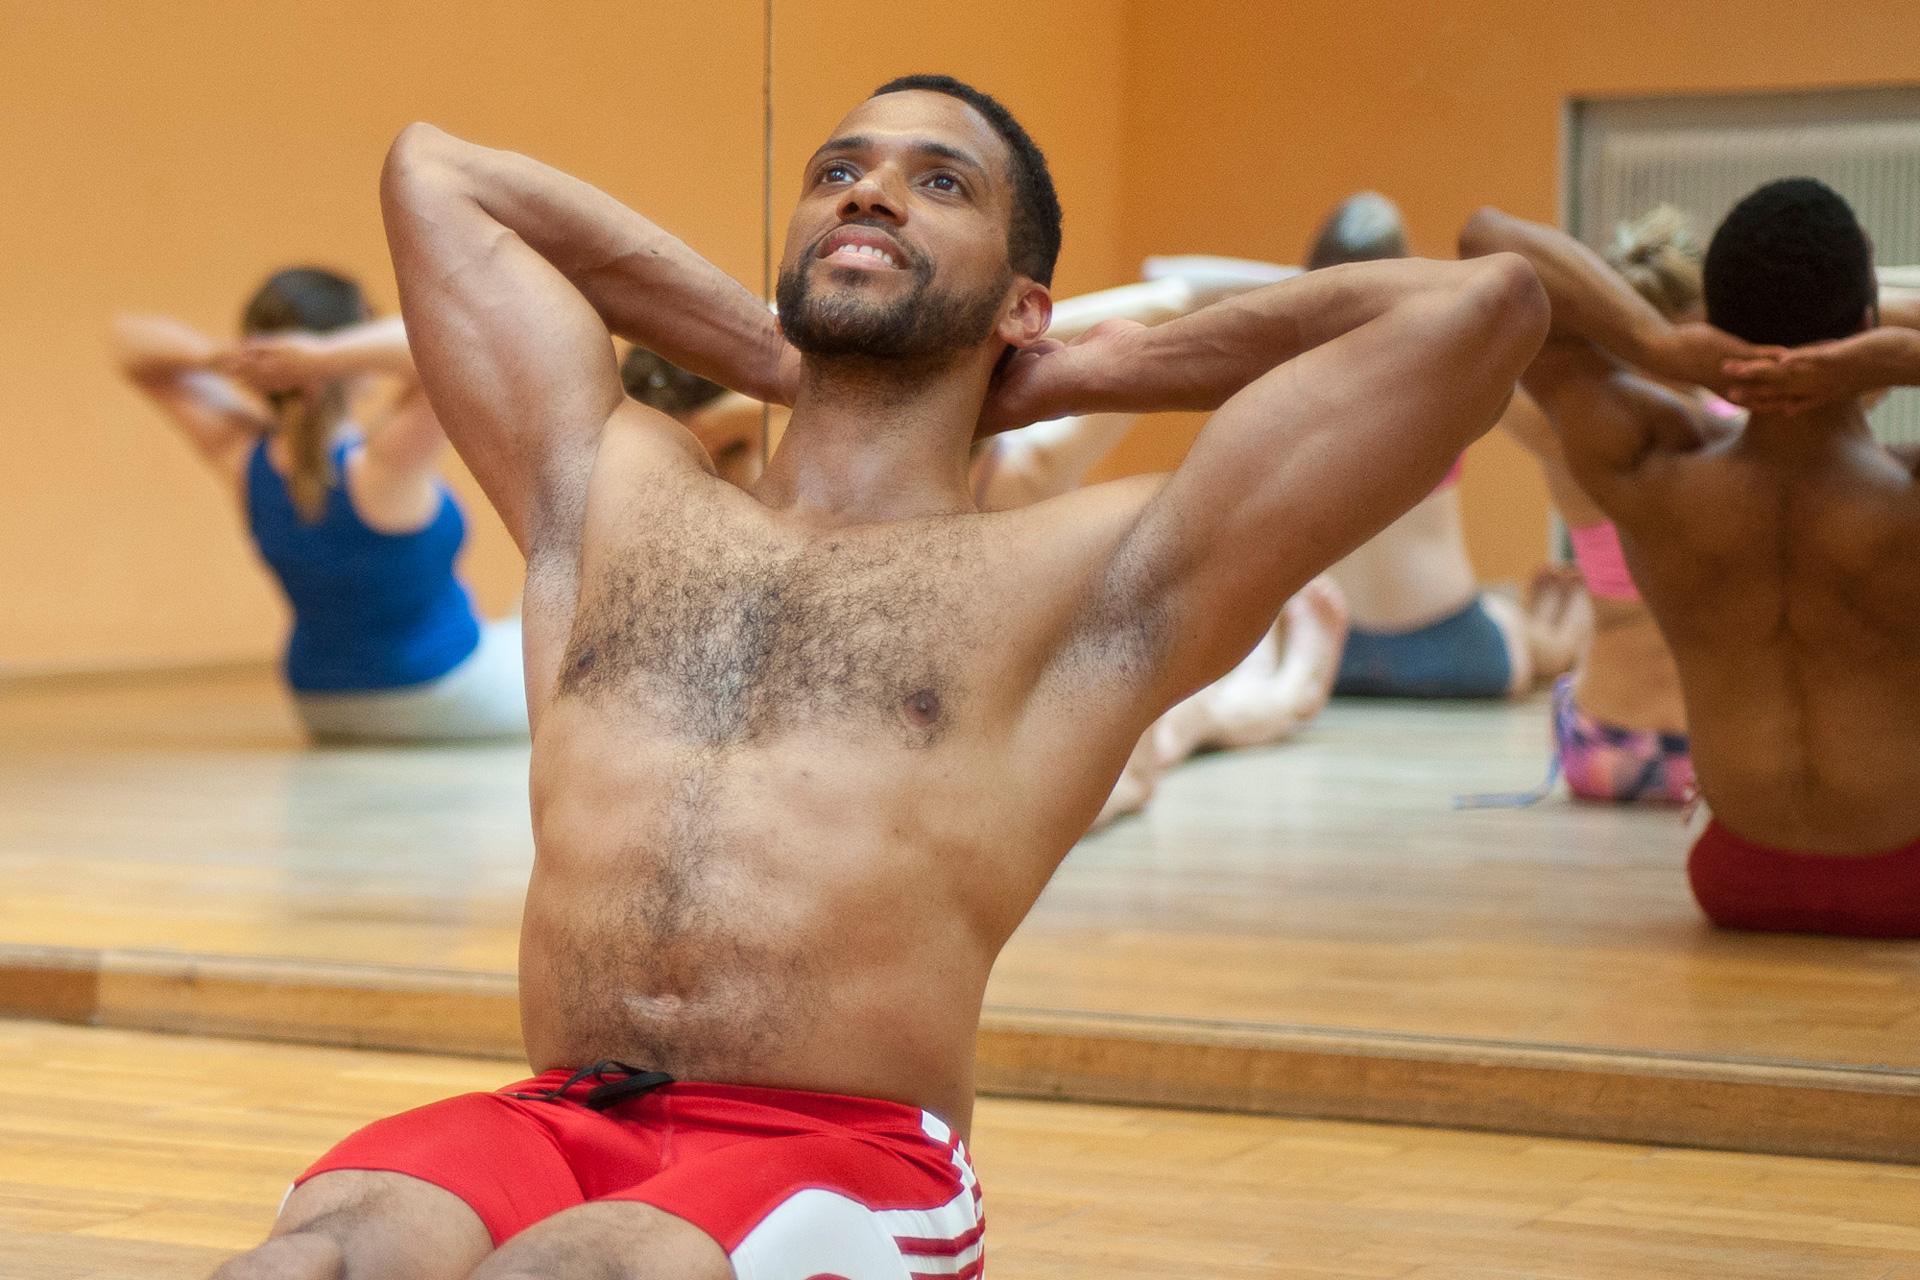 cesar sampson bodyhood pilates training